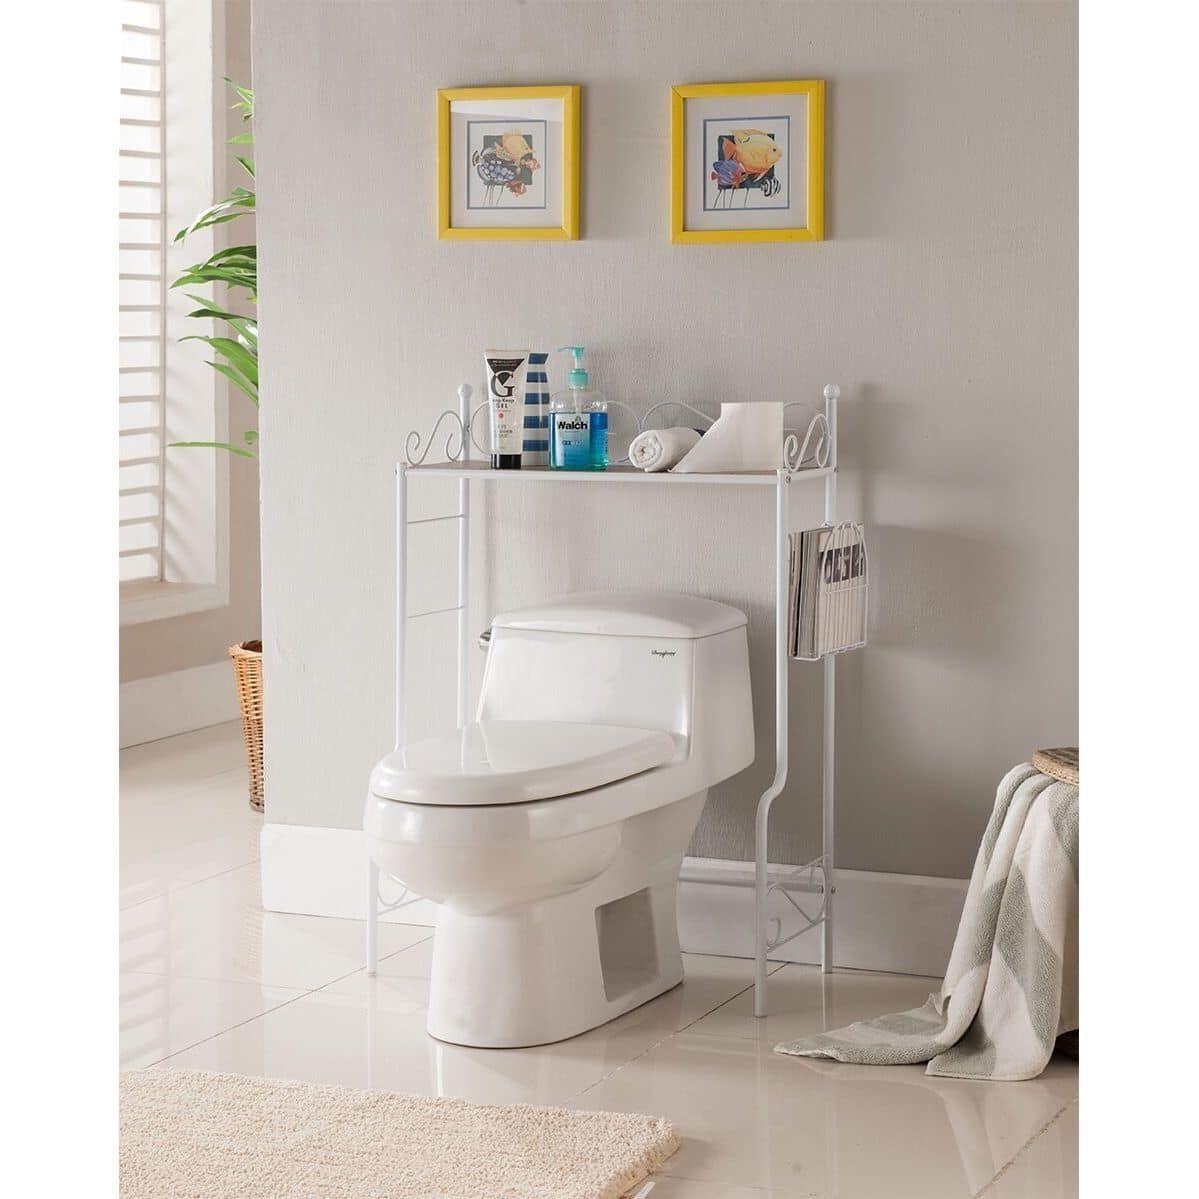 K&B Over the Toilet Shelf   Bathroom organization, Bathroom shelving ...